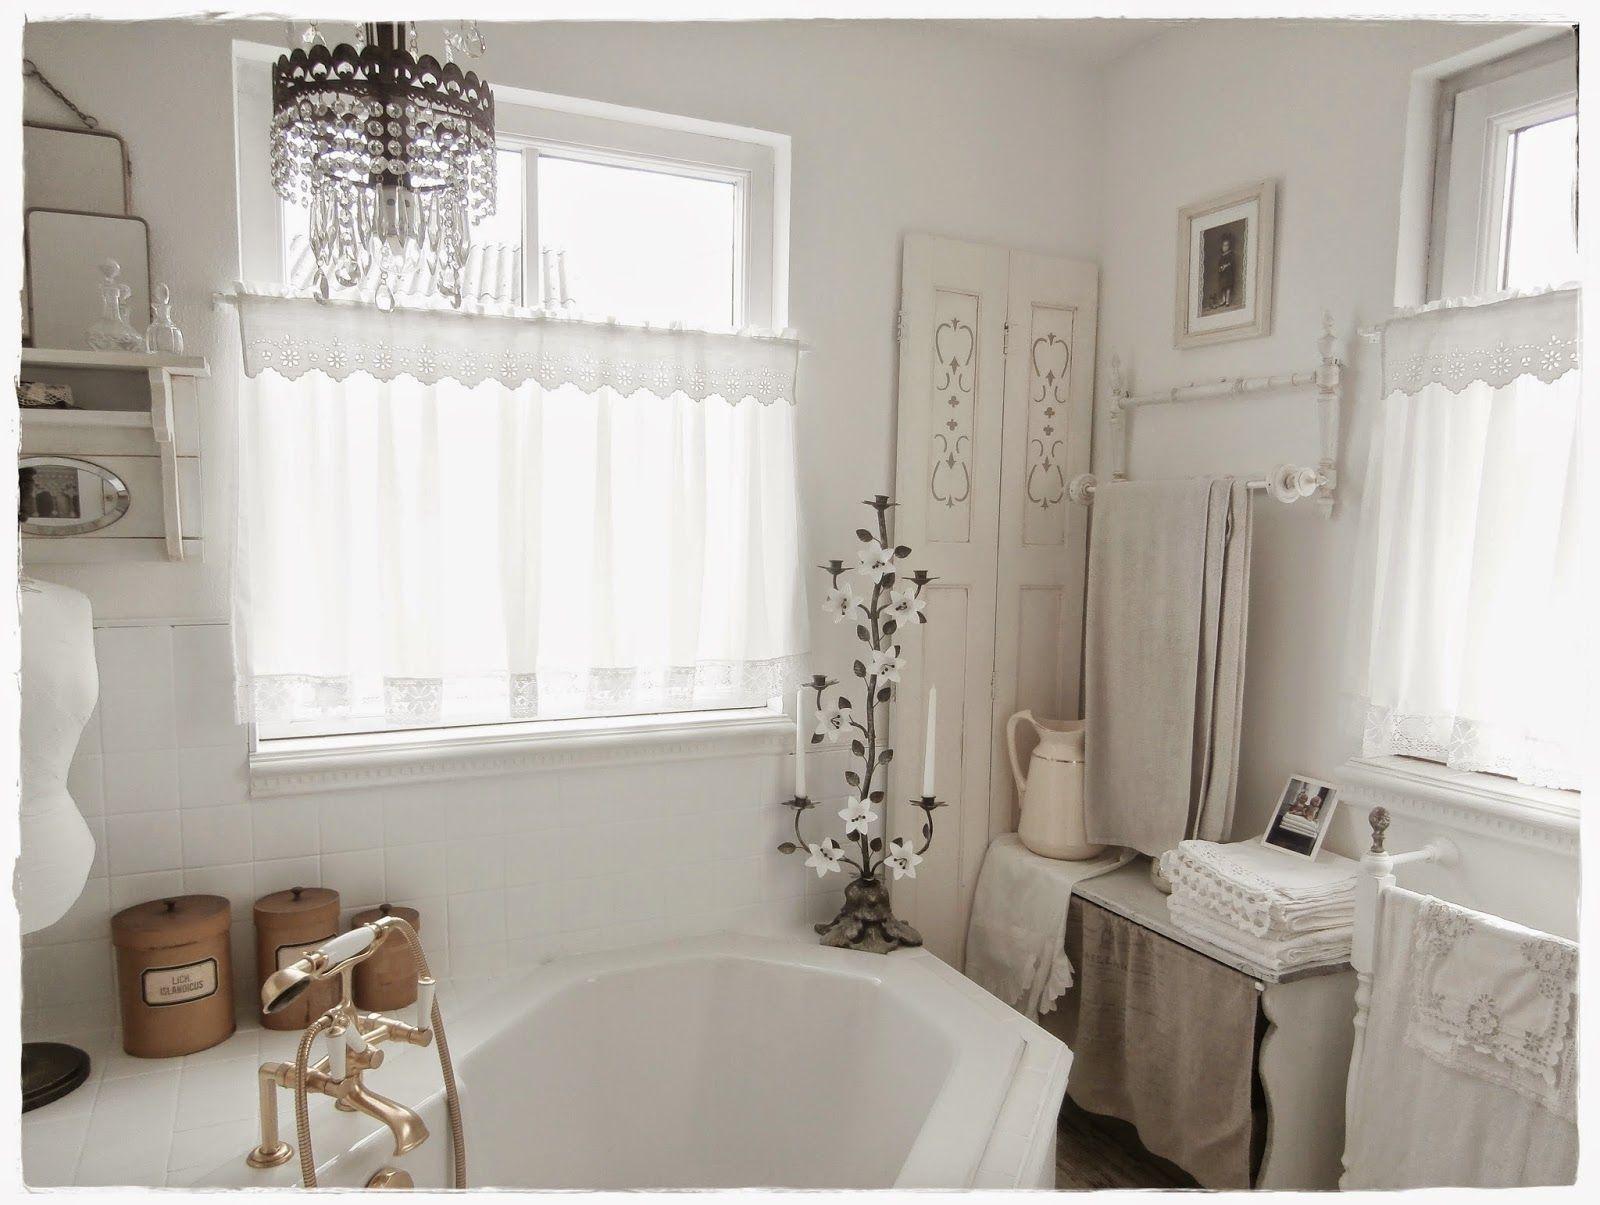 Shabby Landhaus Bad Gardinen Traumhafte Badezimmer Shabby Chic Dekoration